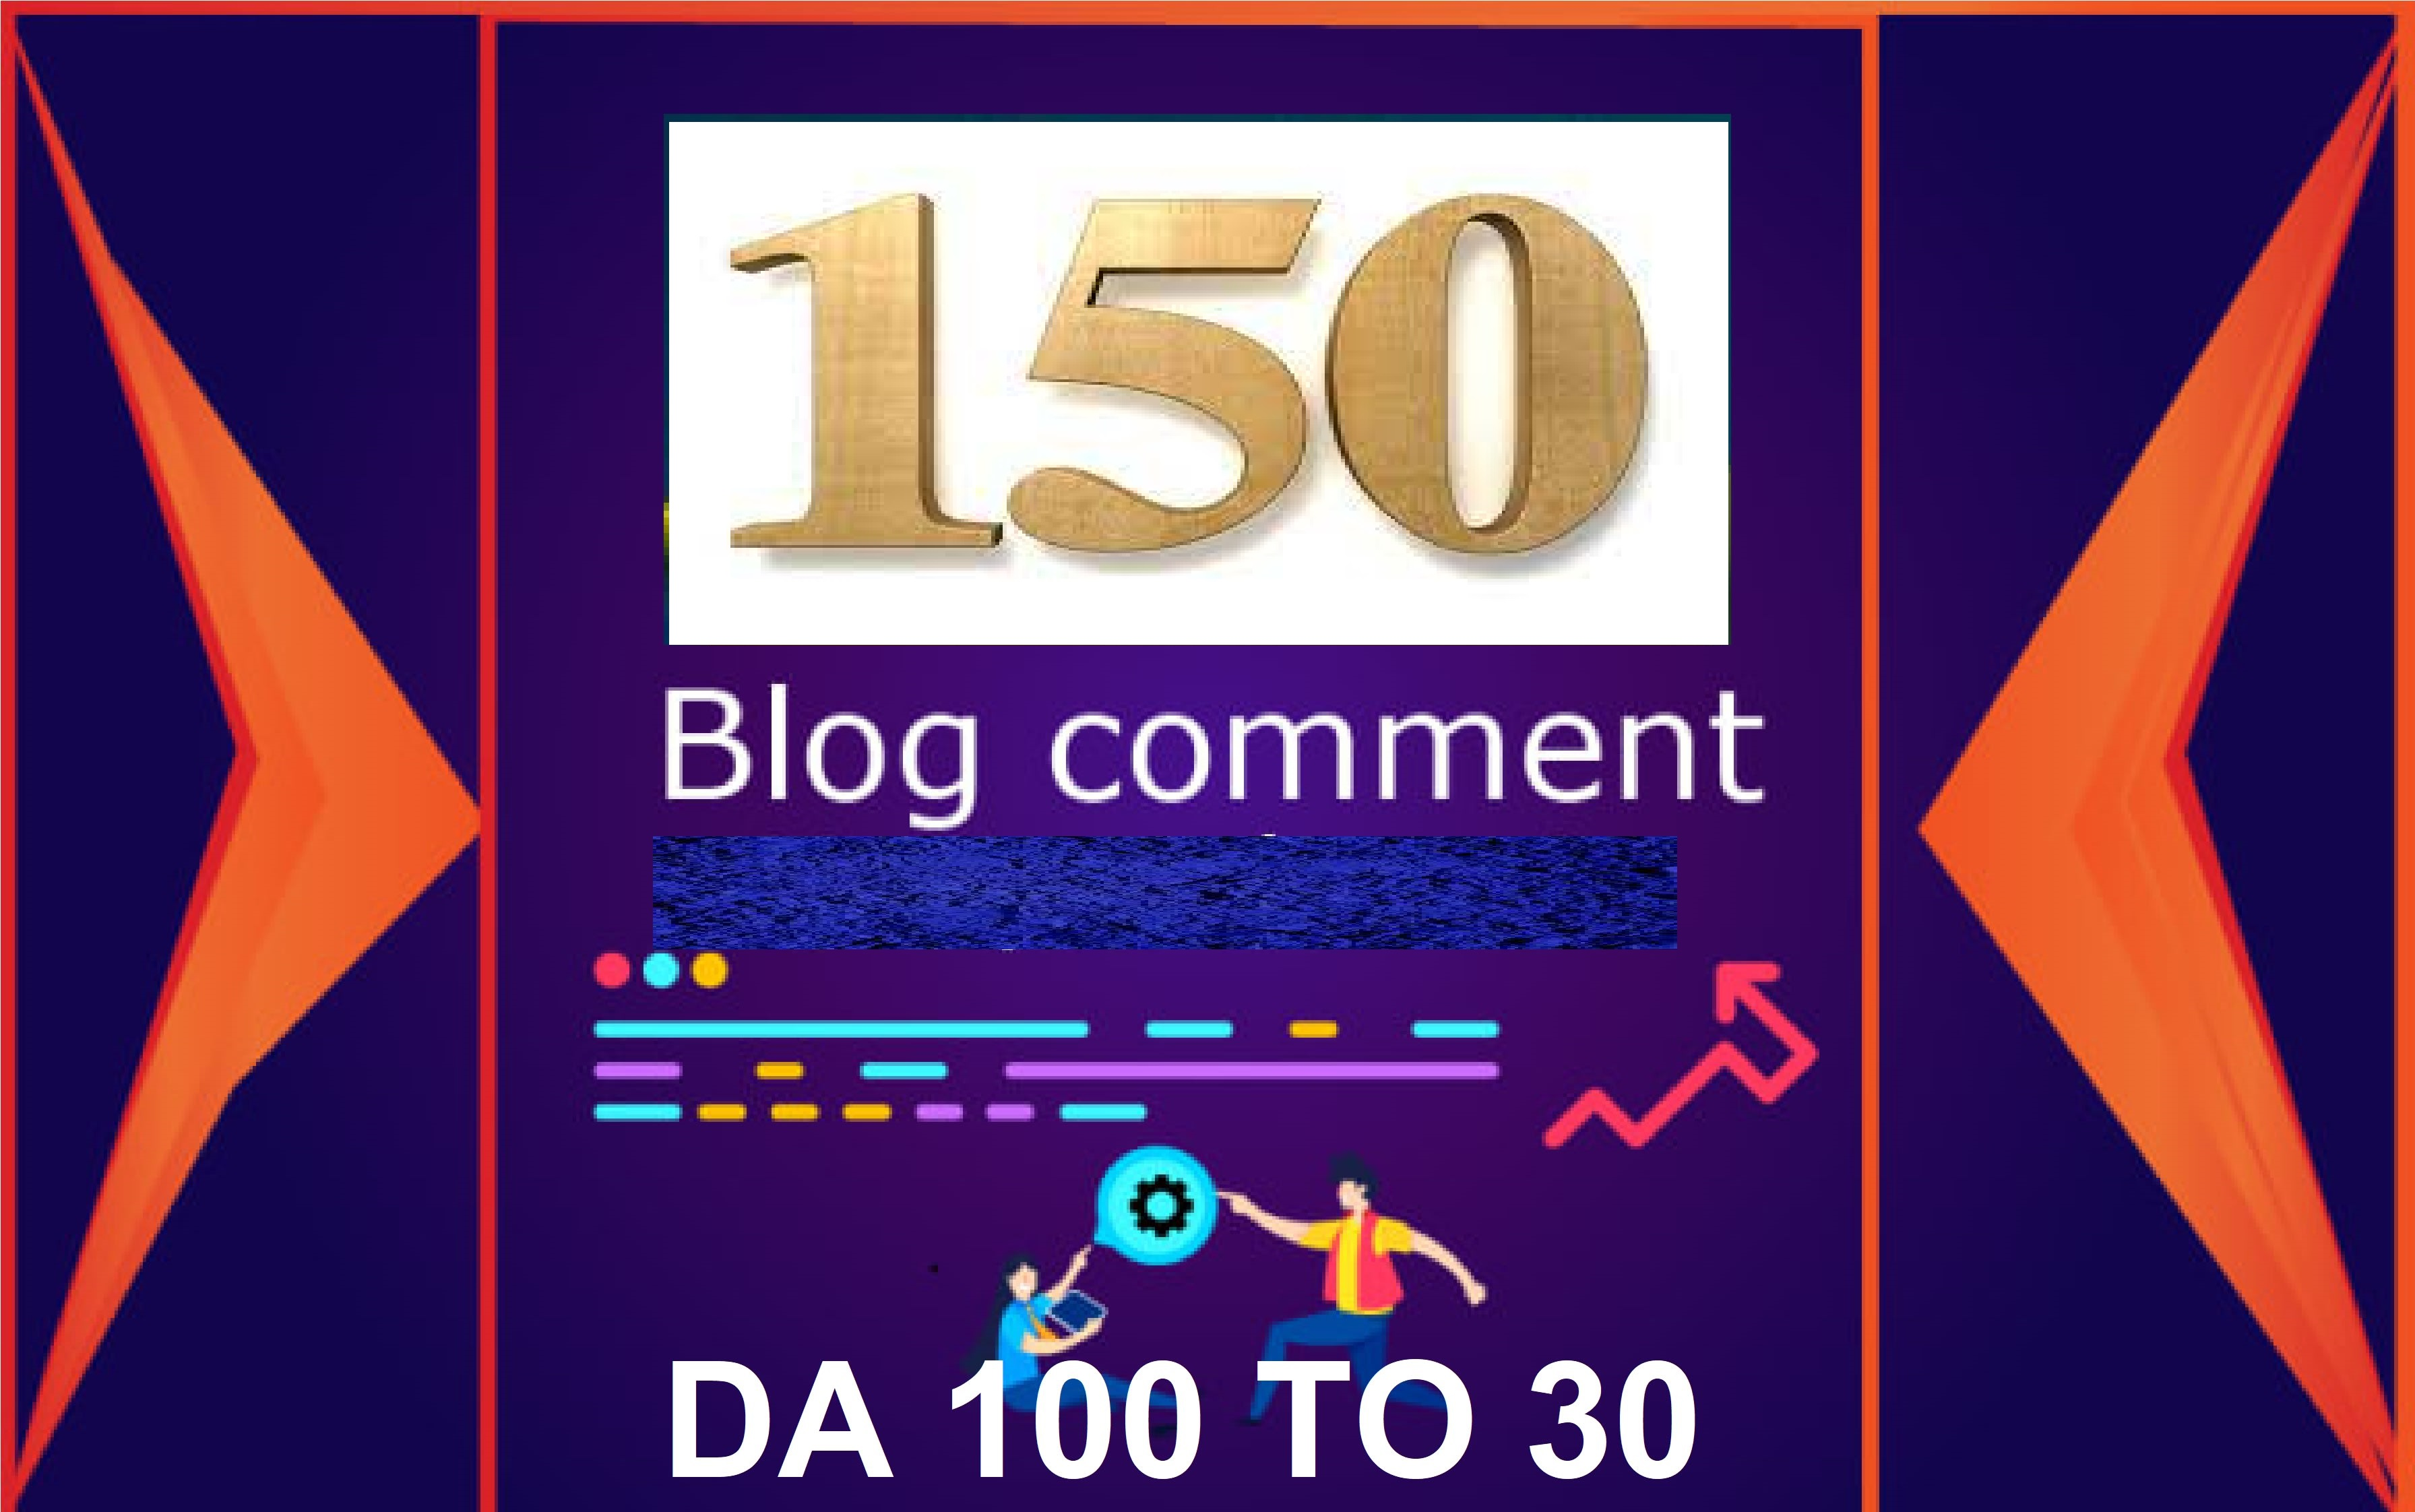 Give you 150 blog comments backlinks high da pa